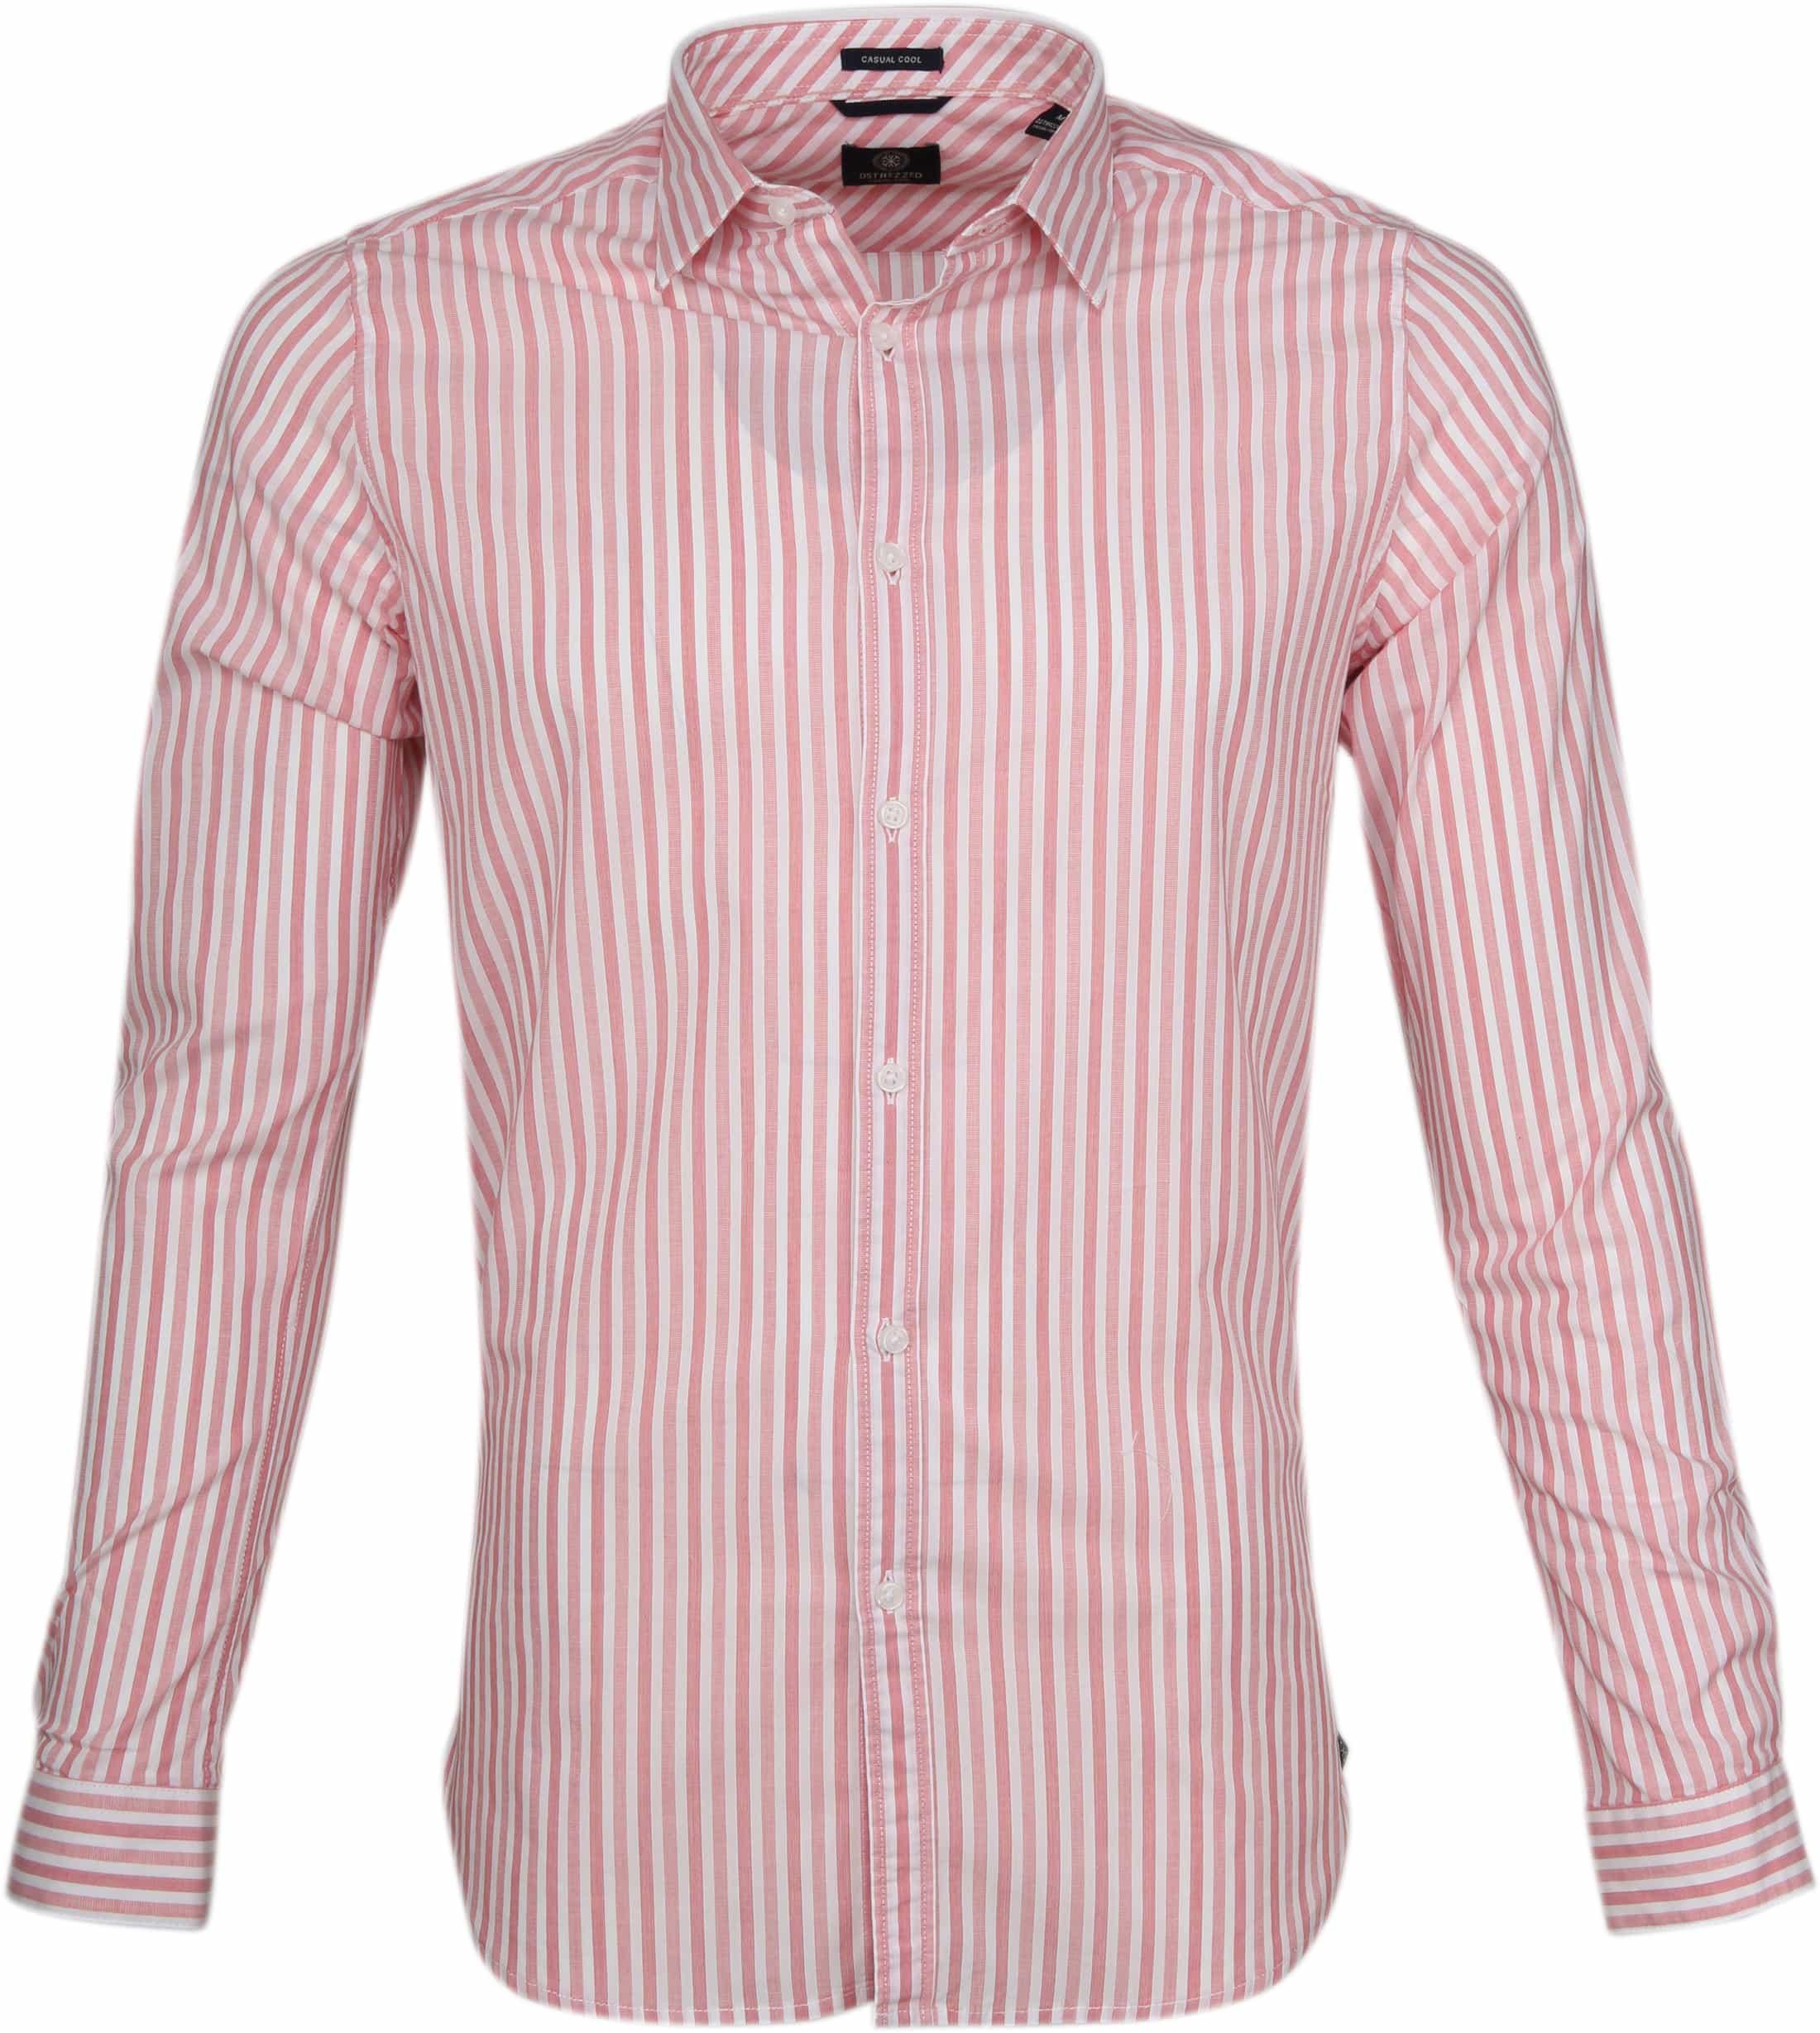 Dstrezzed Shirt Stripes foto 0